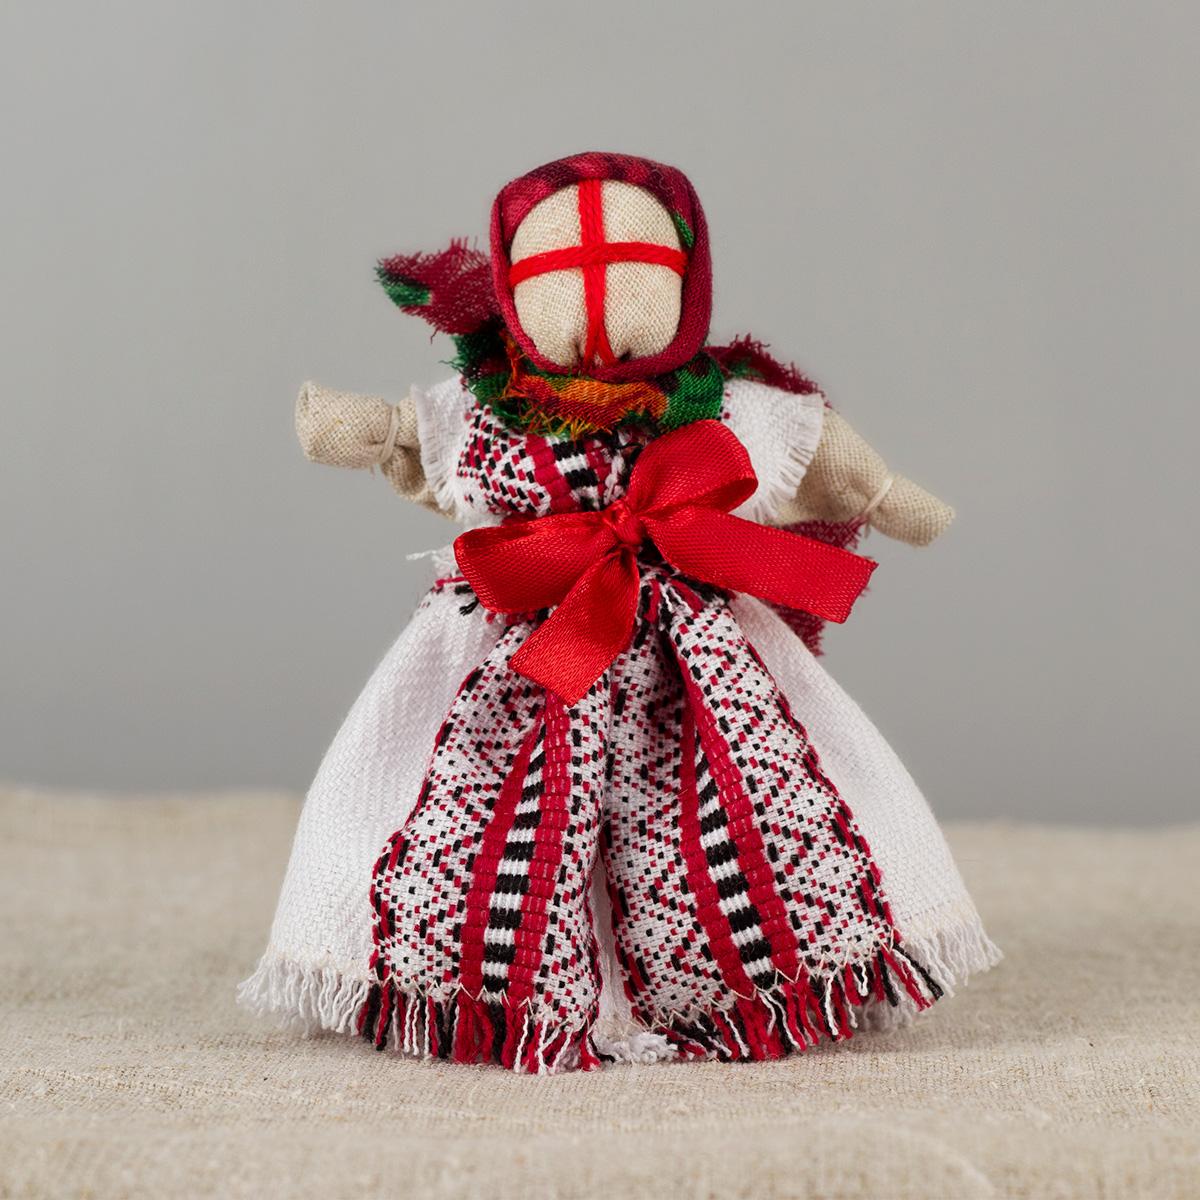 Mana intuition Motanka doll